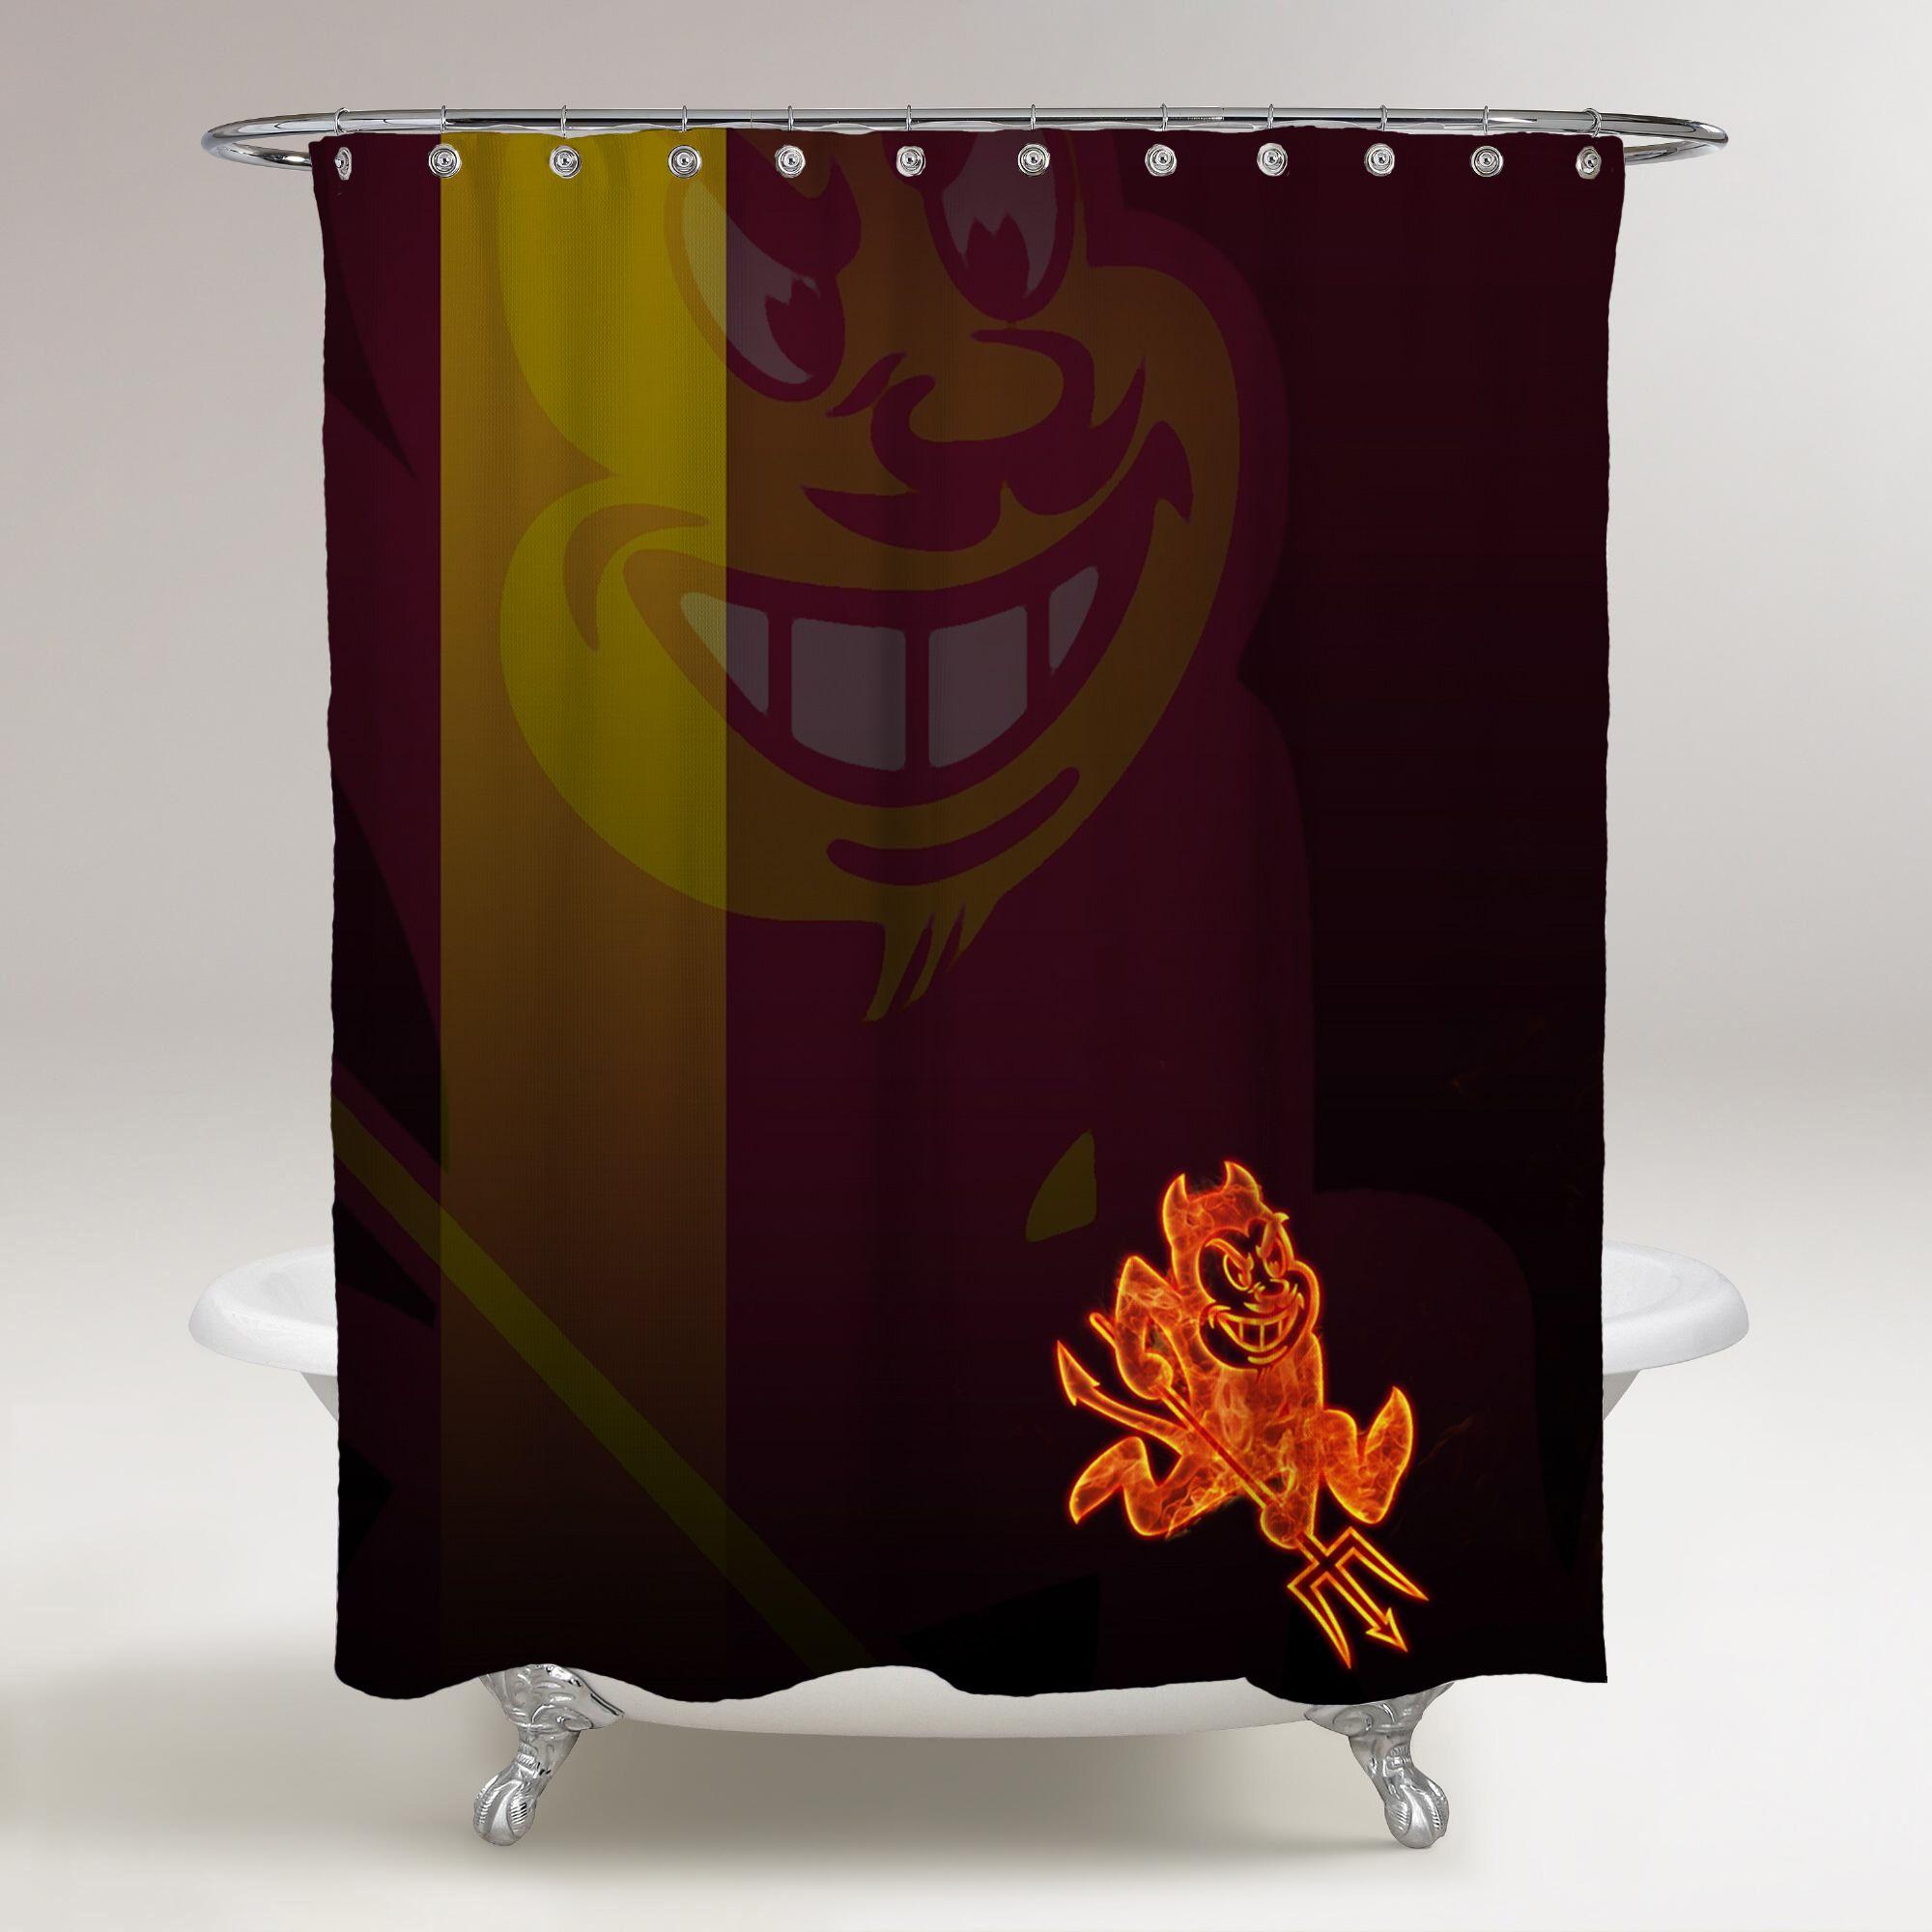 Arizona State Sun Devils Logo In Flames Wallpaper Logo Background